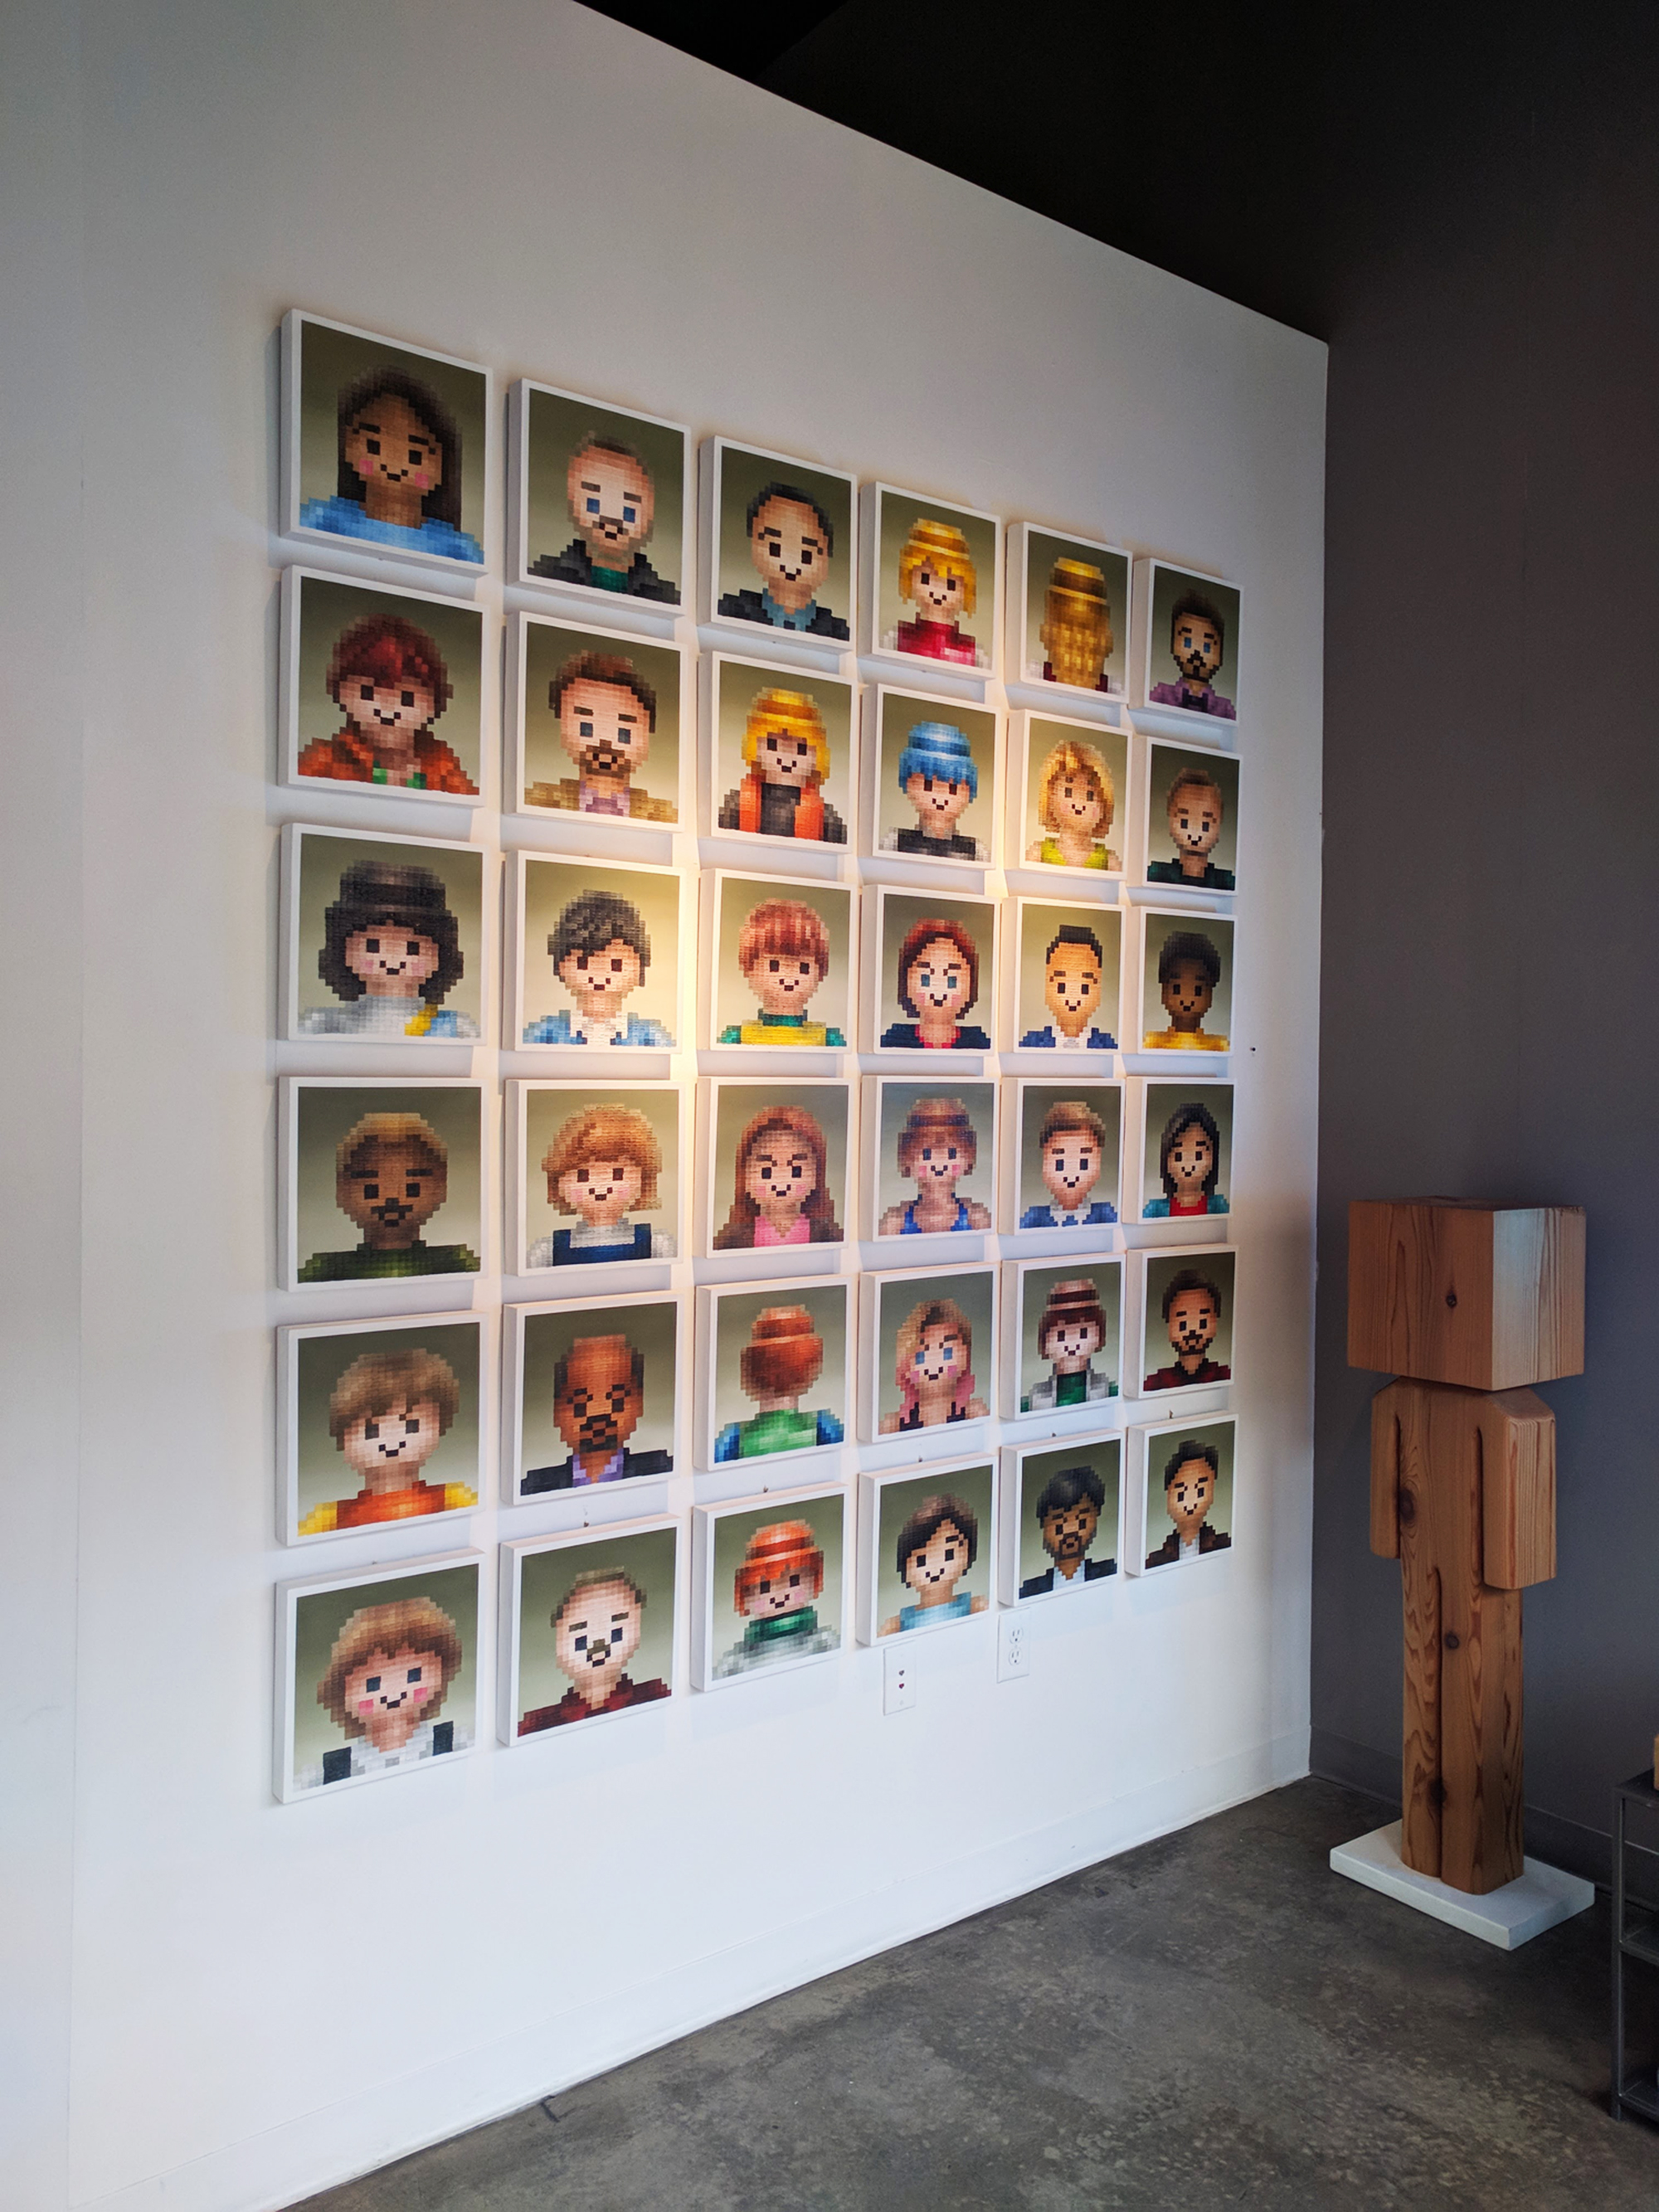 Inkyeong Baek Playmobils 22 oil on wood panel 11 x 11 inches IBA 002G